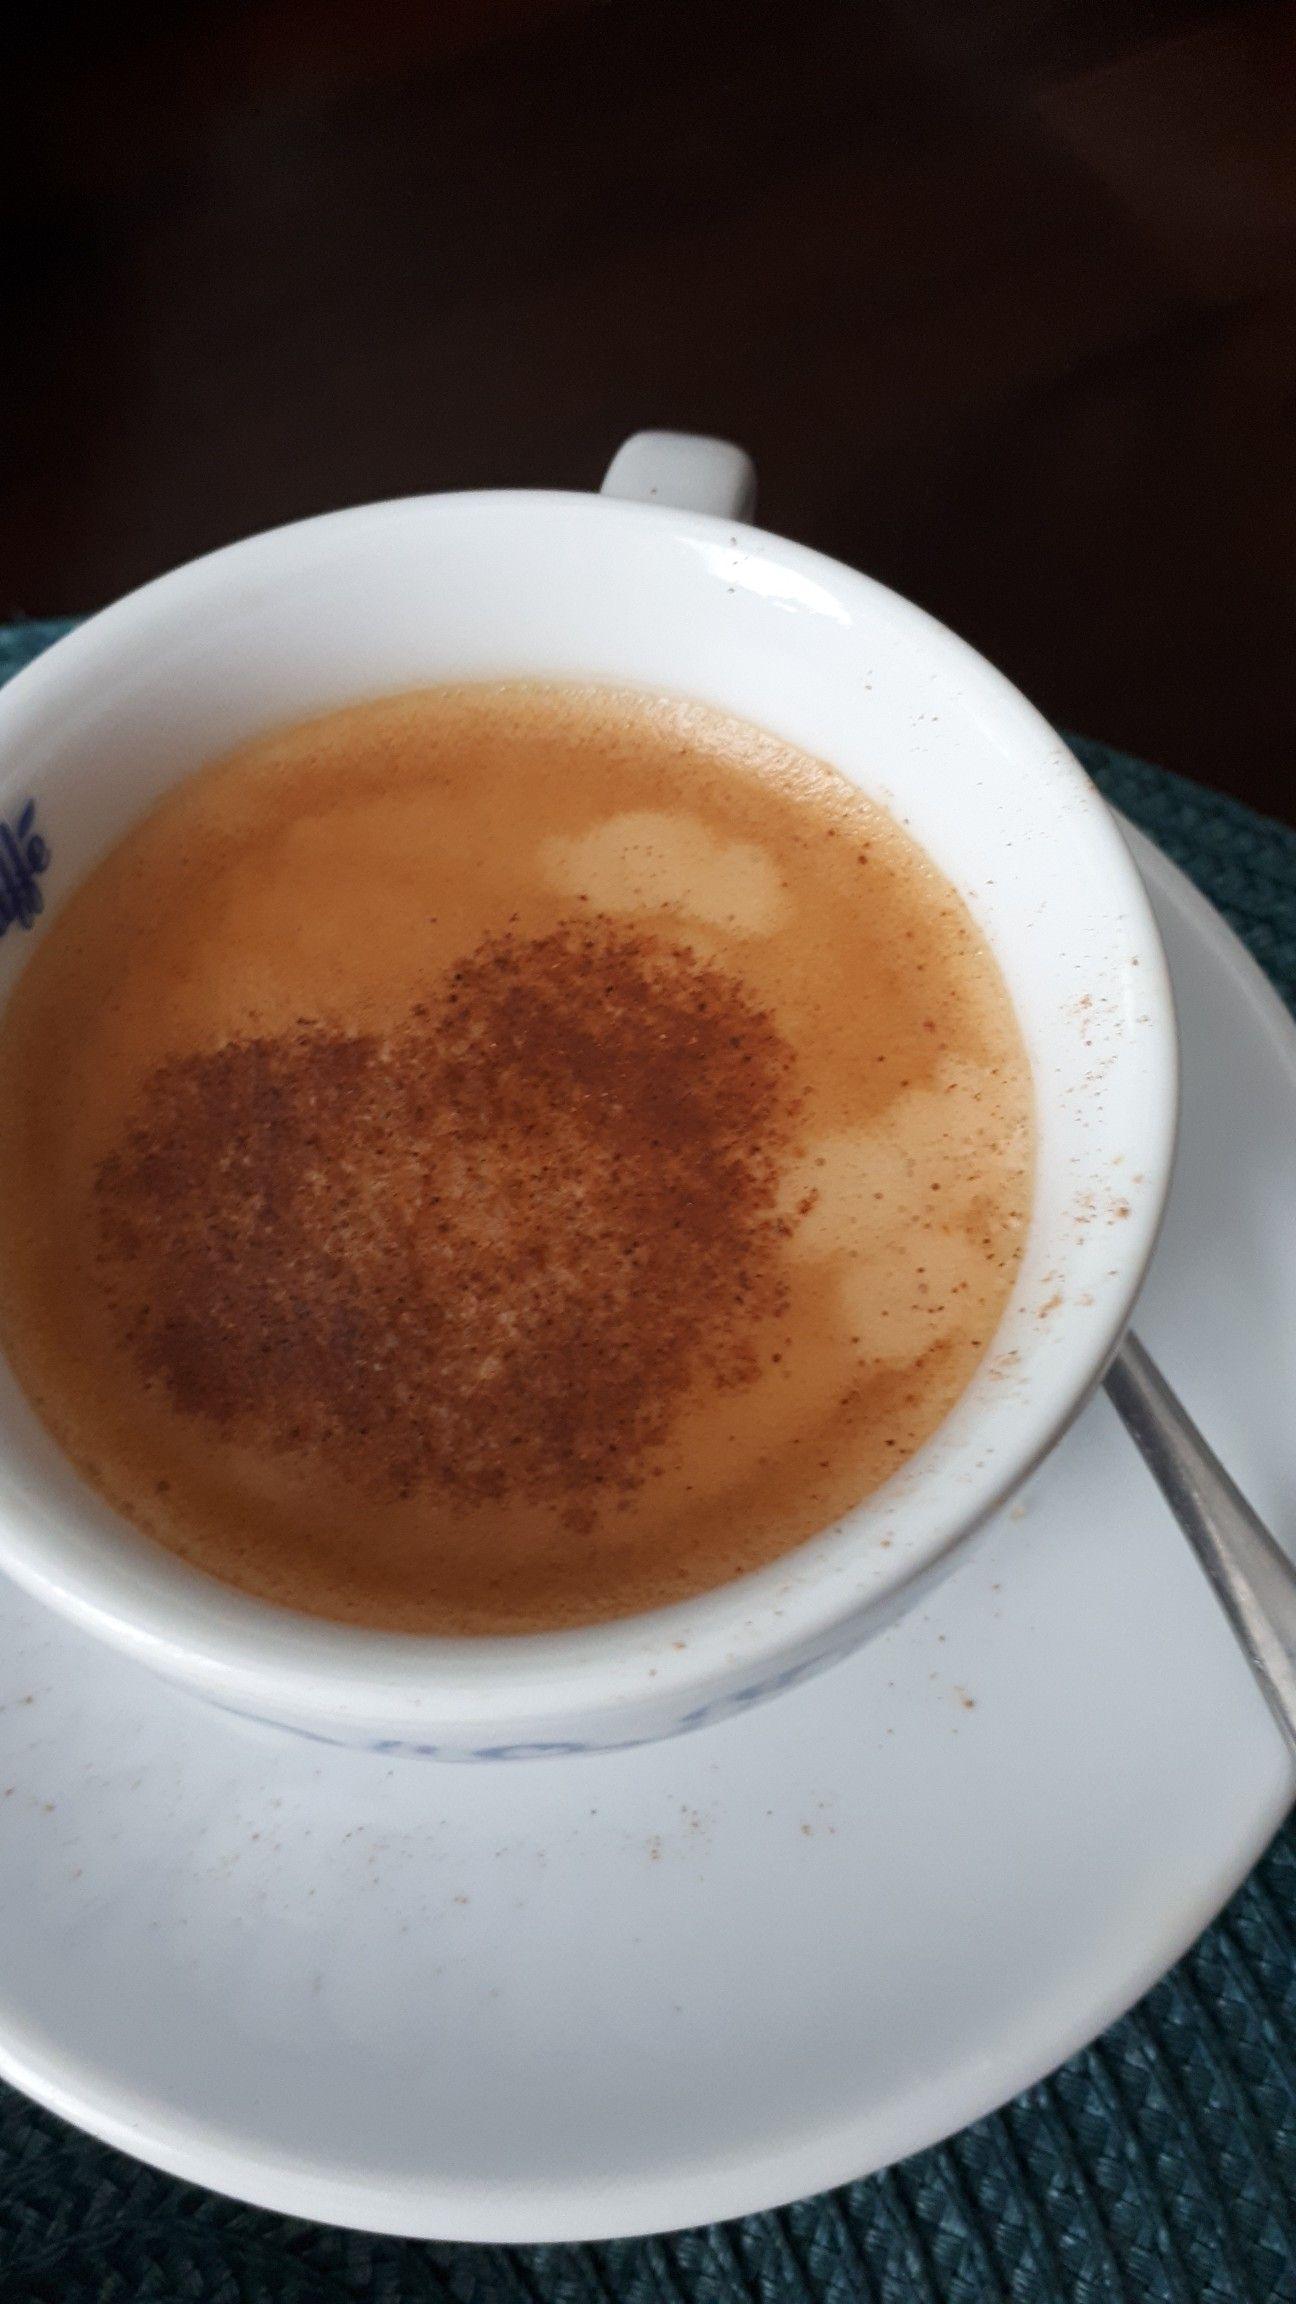 Pin By Gabriela Baranicova On Kava Caffe Tableware Glassware Caffe